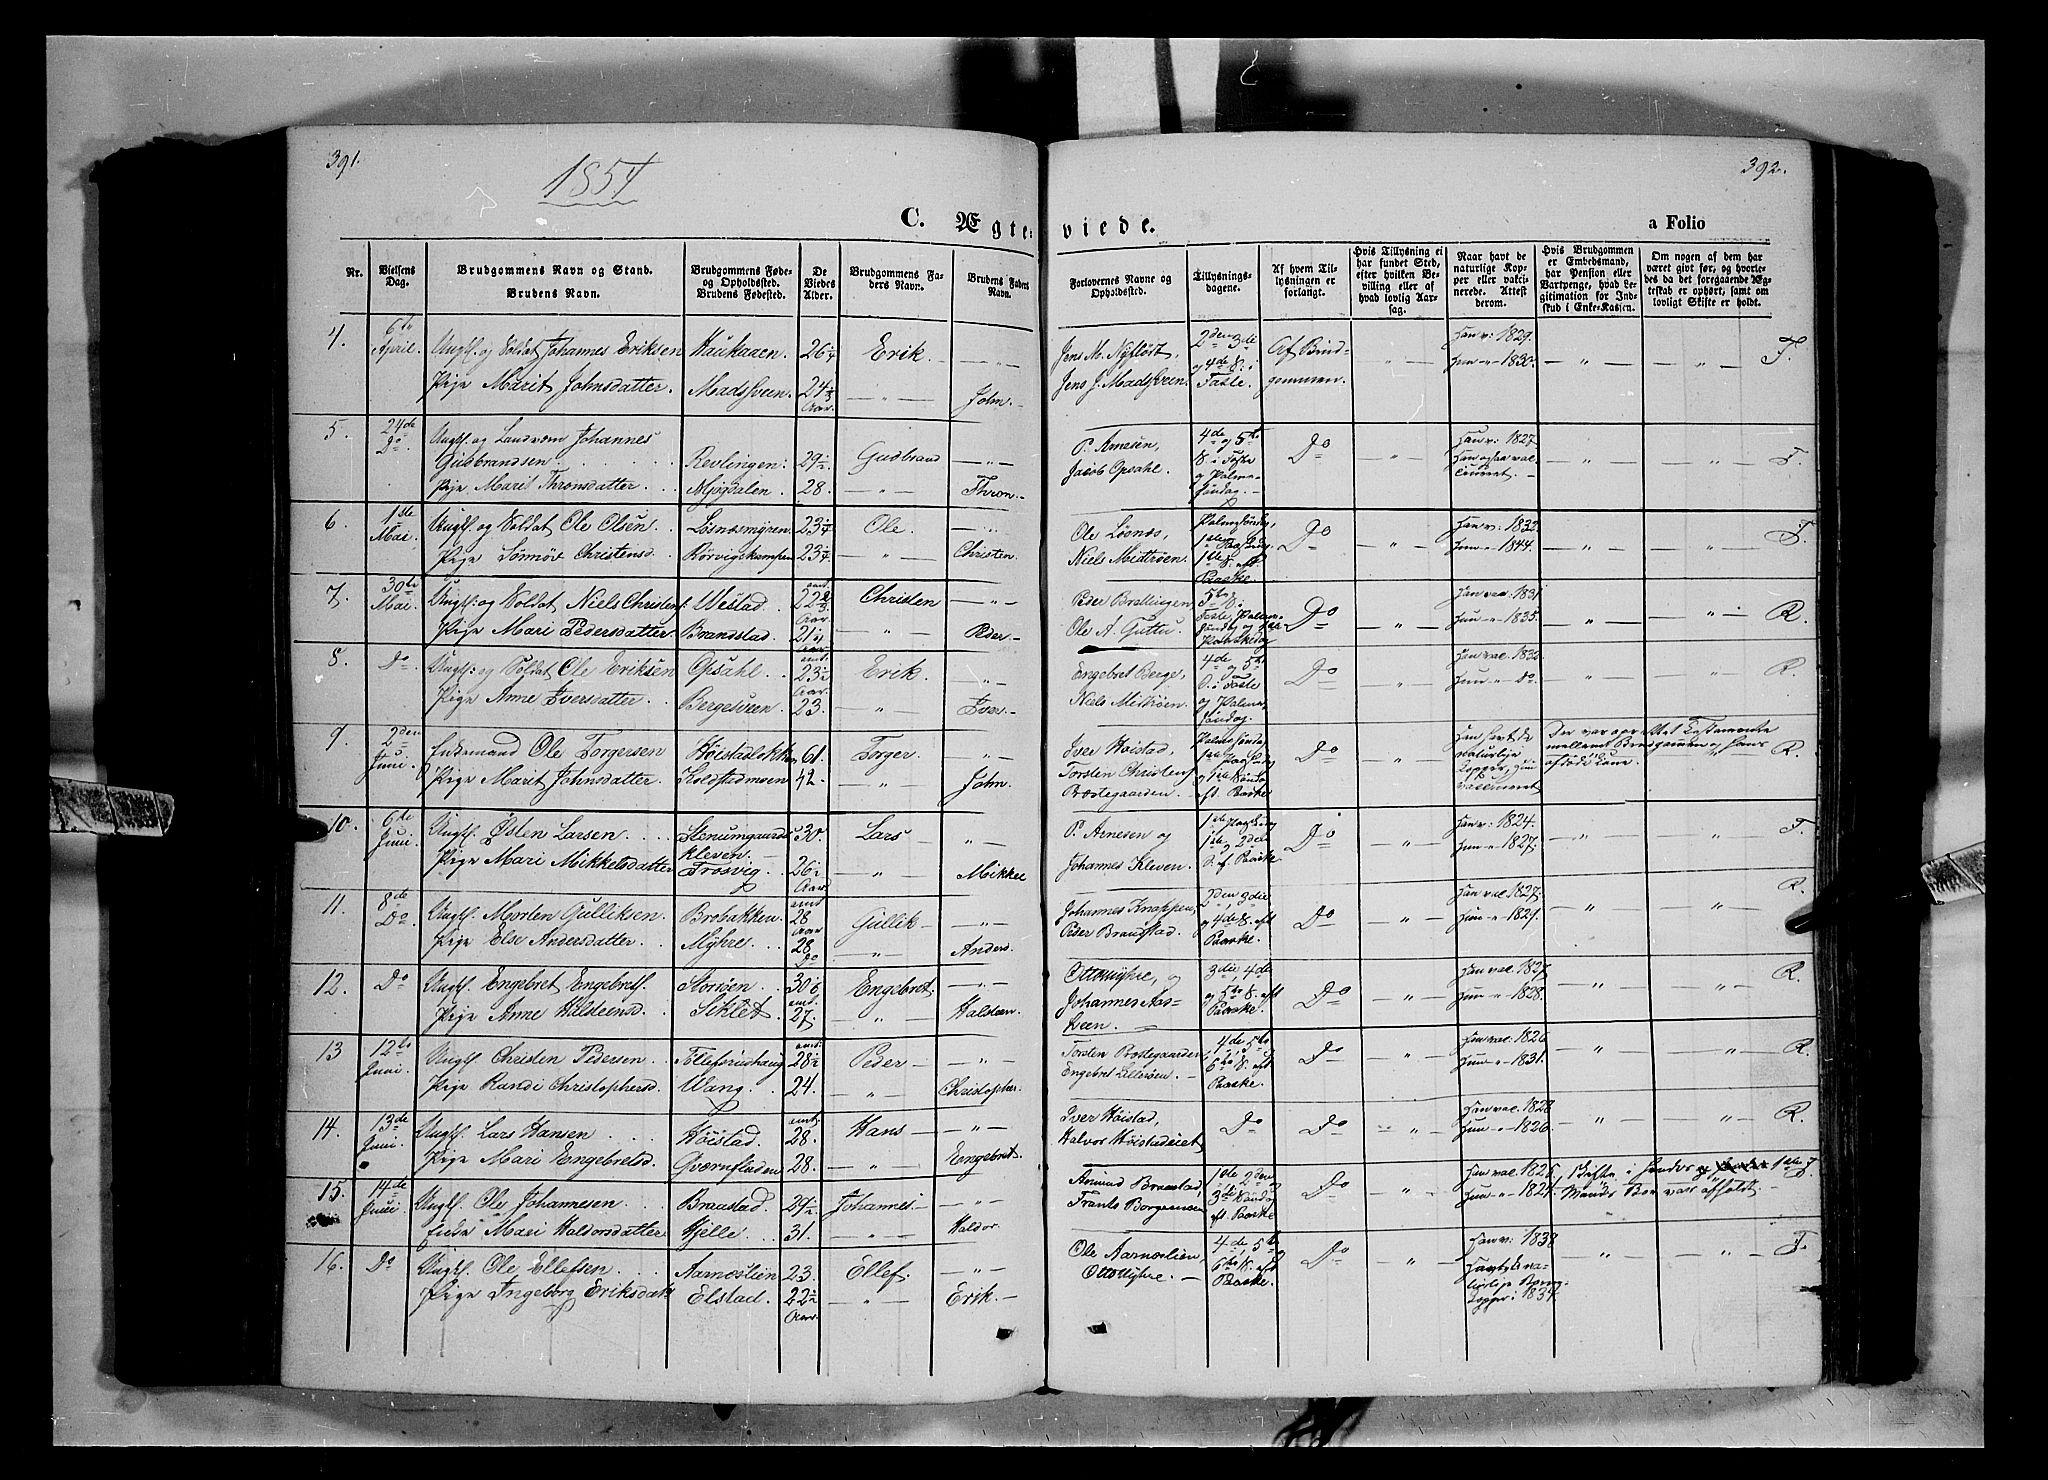 SAH, Ringebu prestekontor, Ministerialbok nr. 6, 1848-1859, s. 391-392